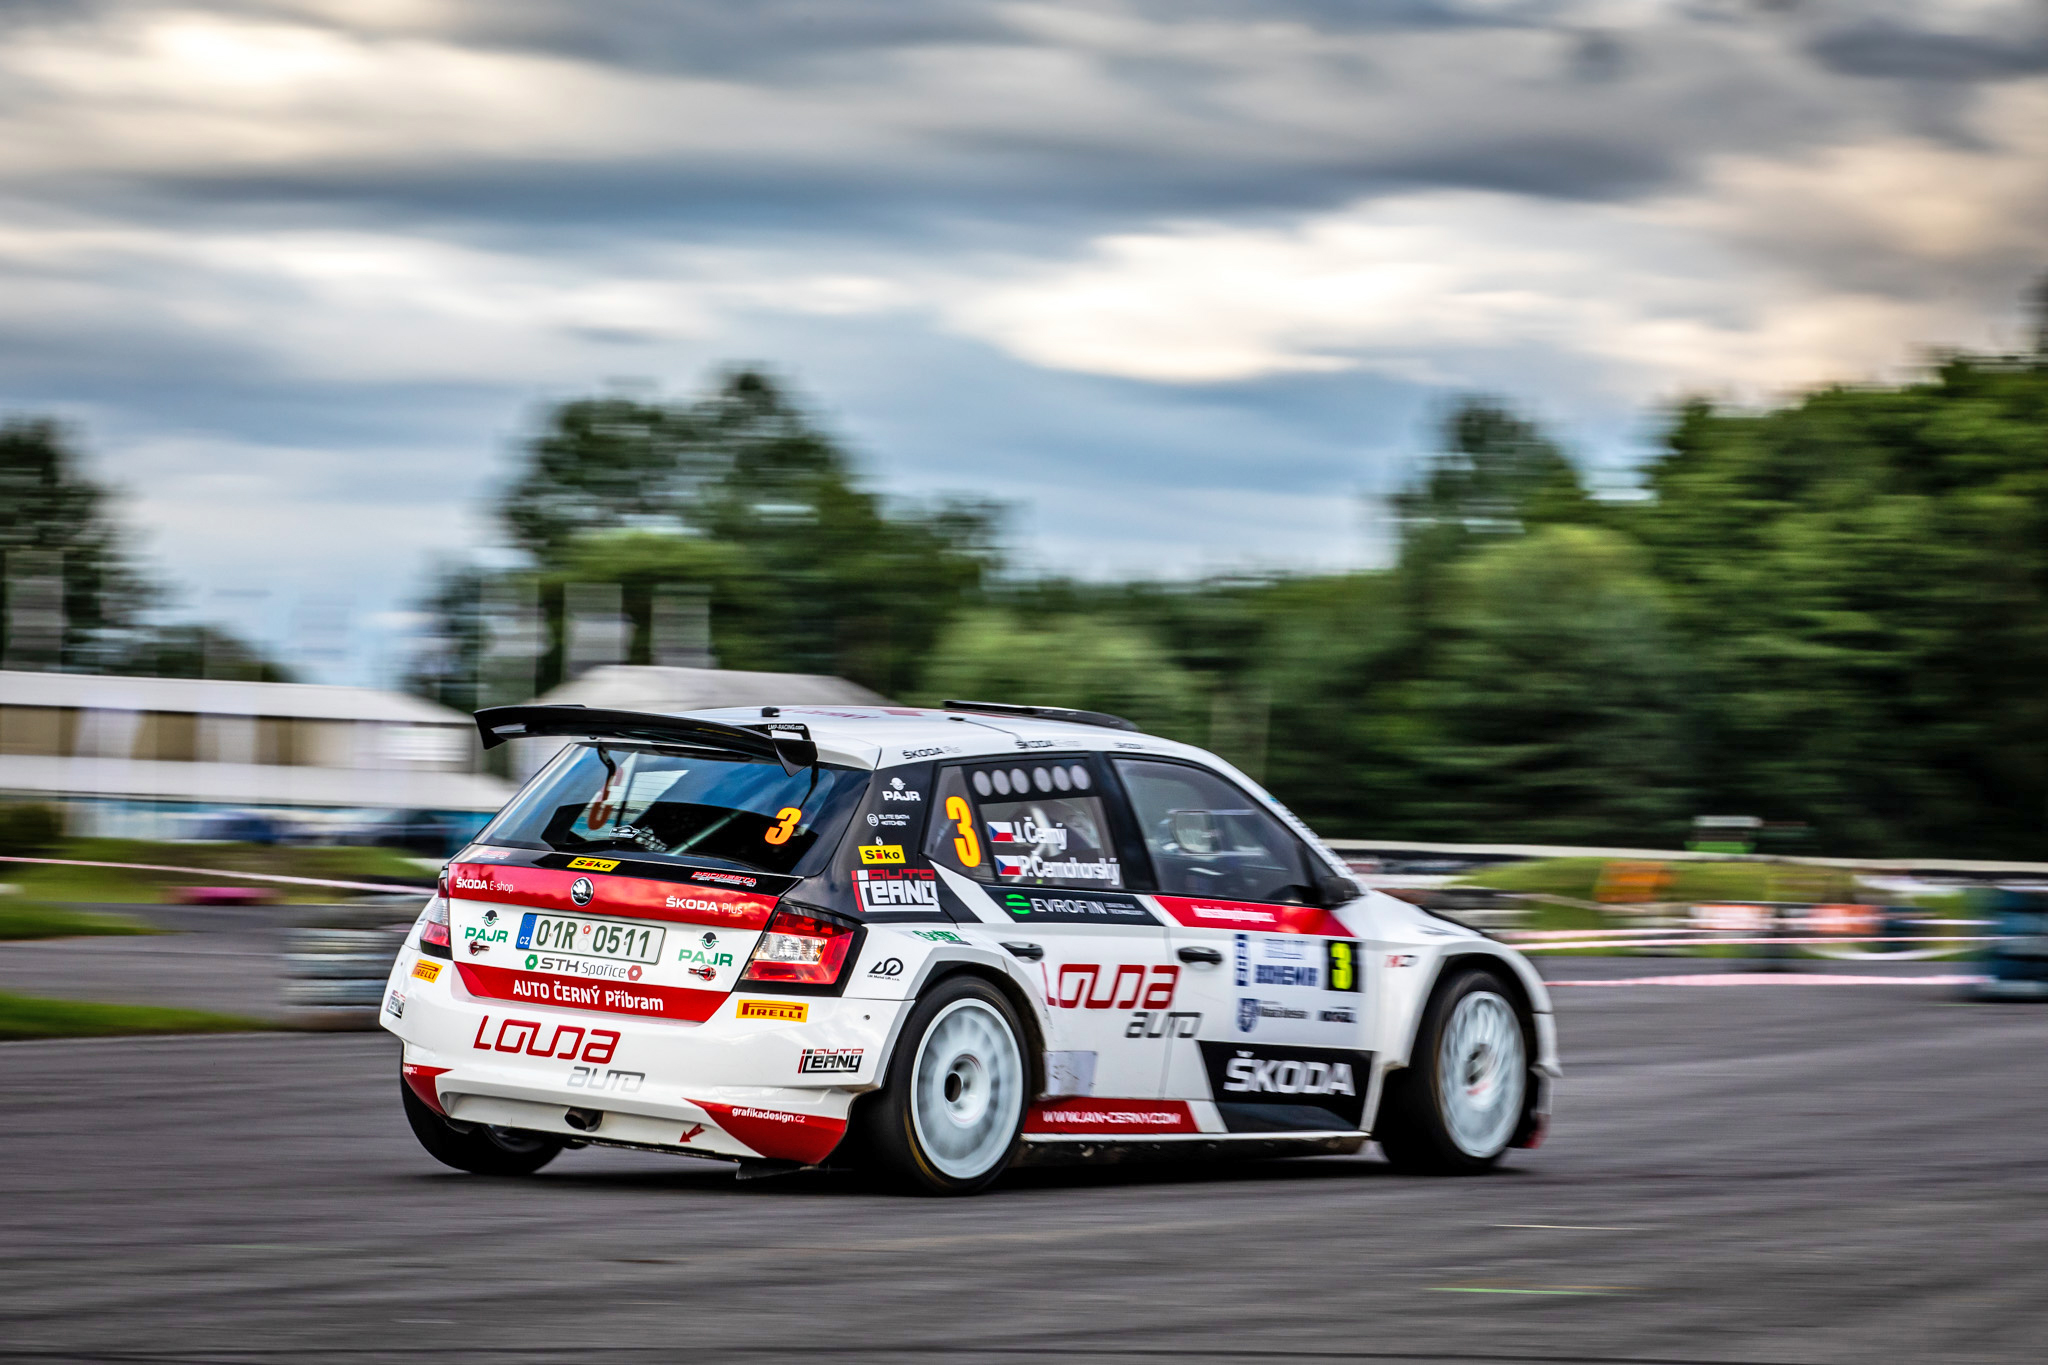 Jan Kopecký celebrates 120 years of SKODA in motorsport with ninth victory at Bohemia Rally - Image 5